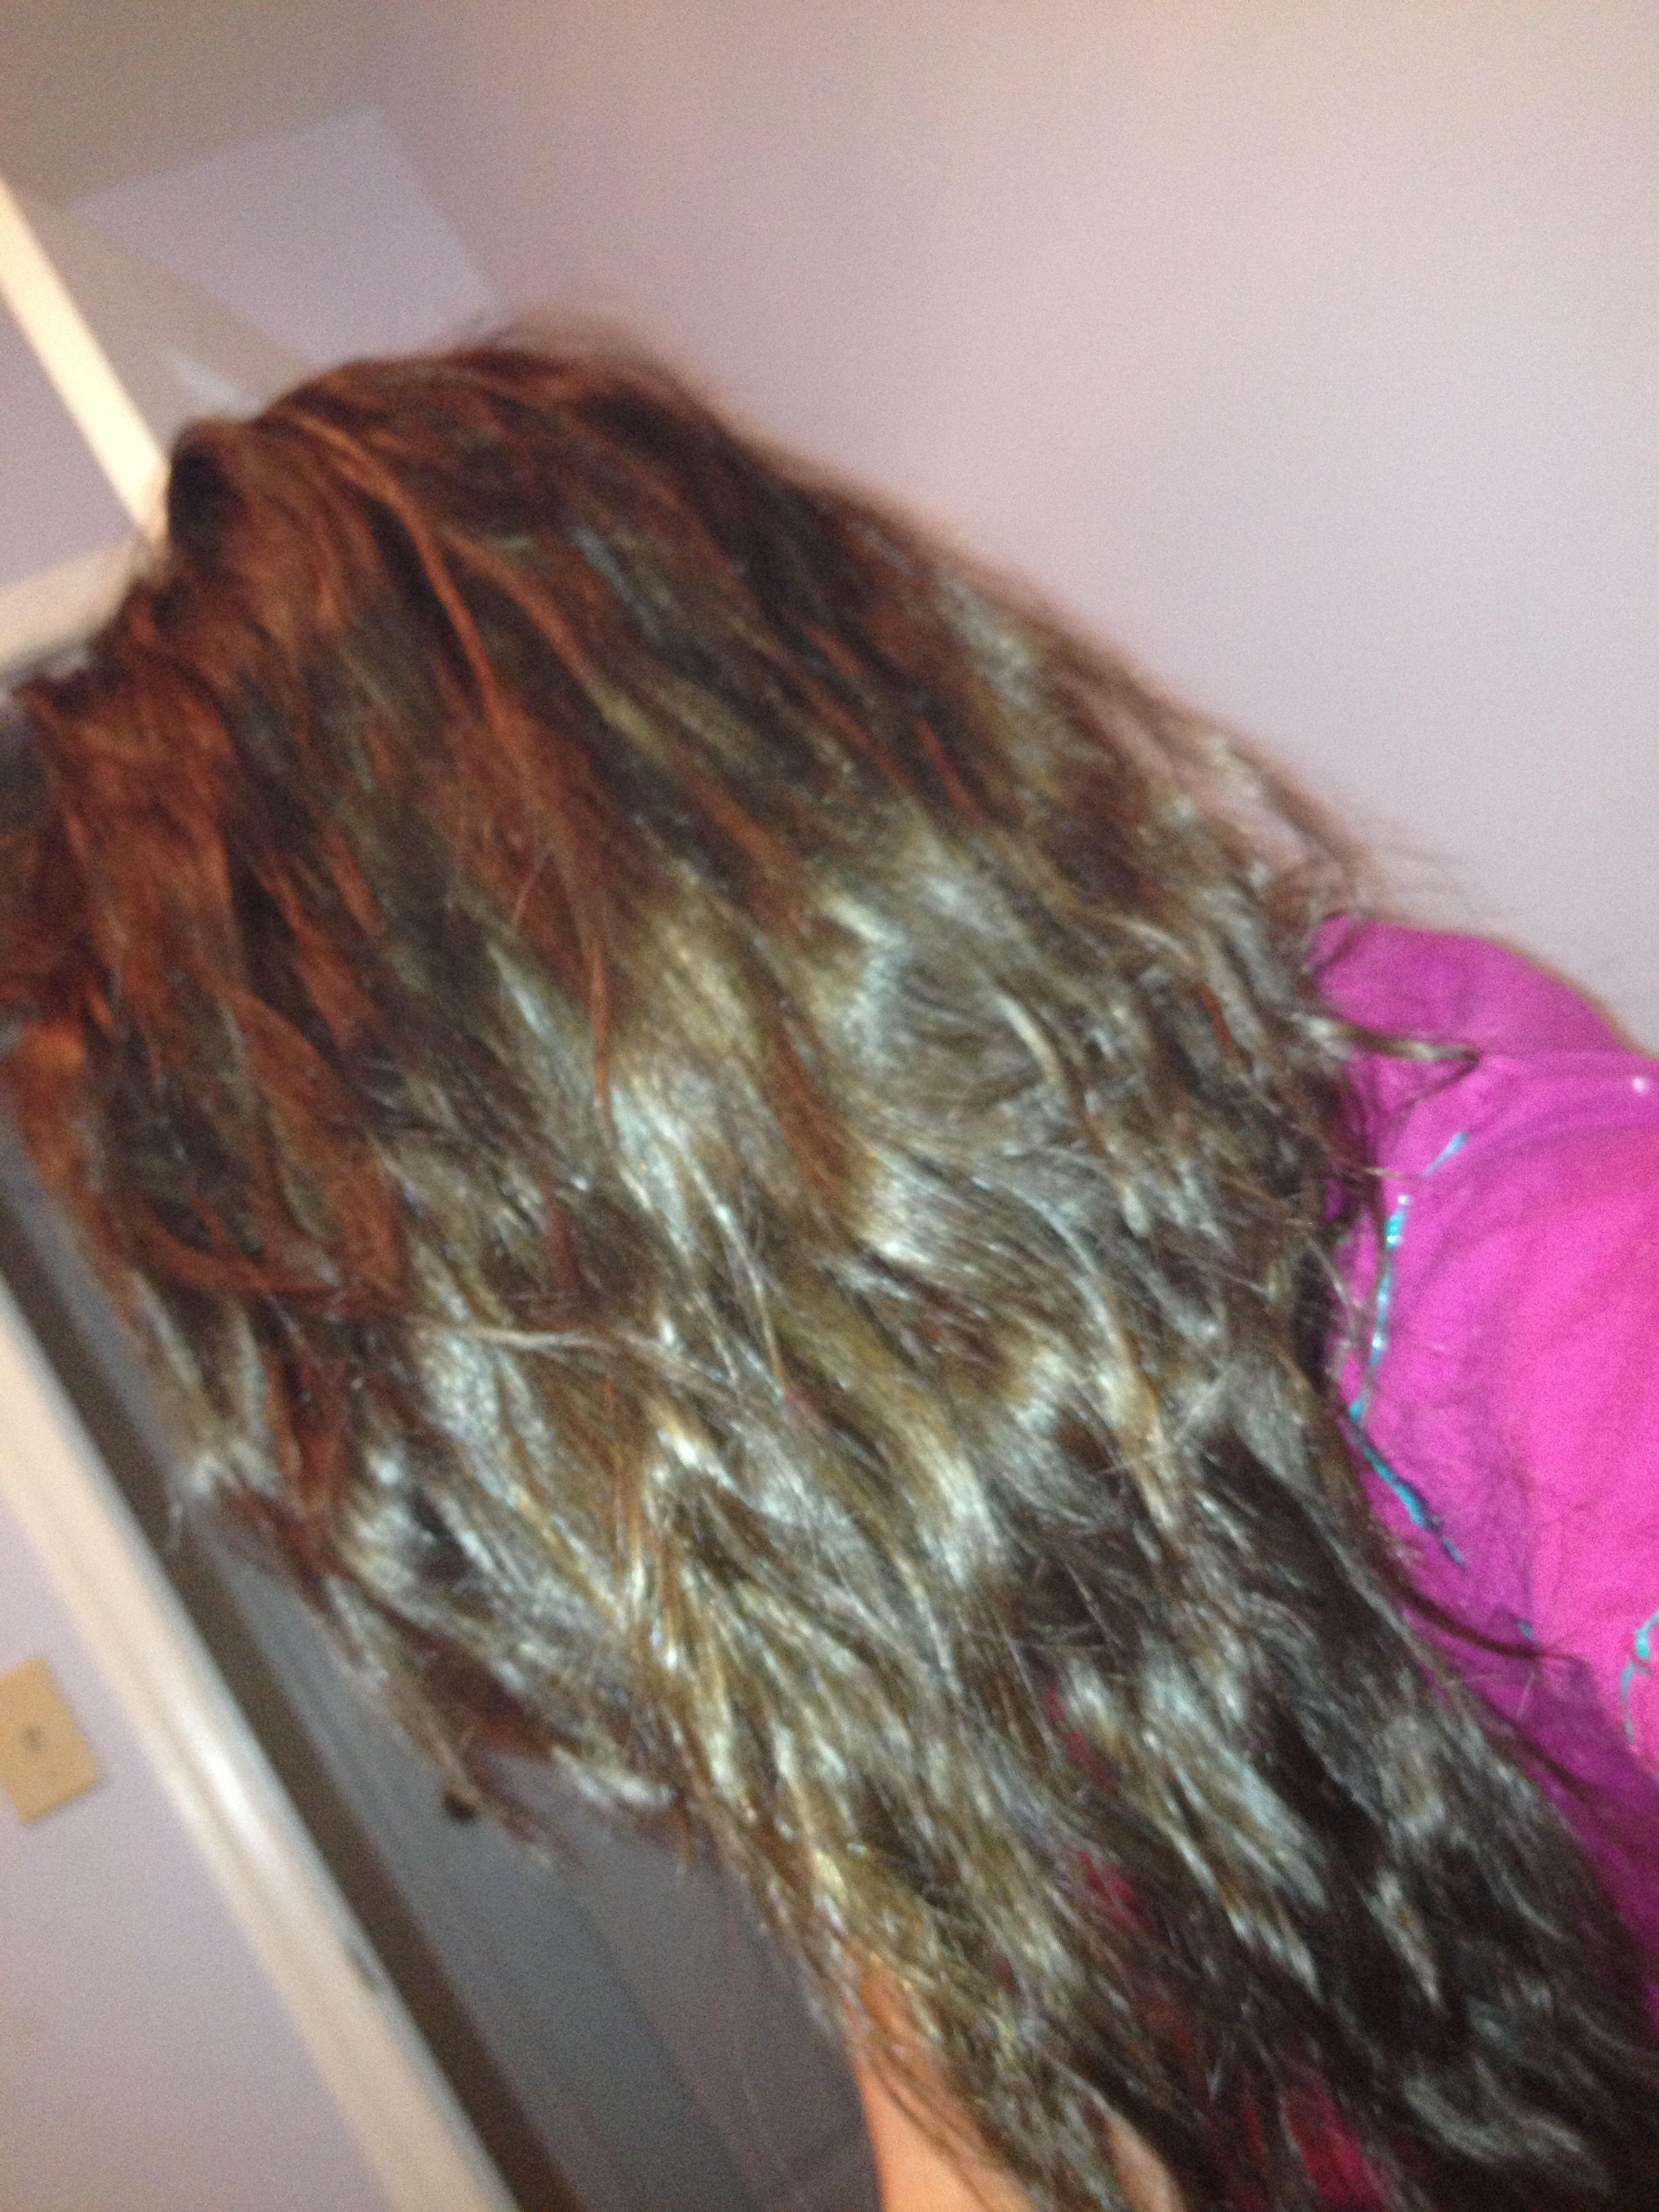 After my shower i did french braids back u slept on it woke up